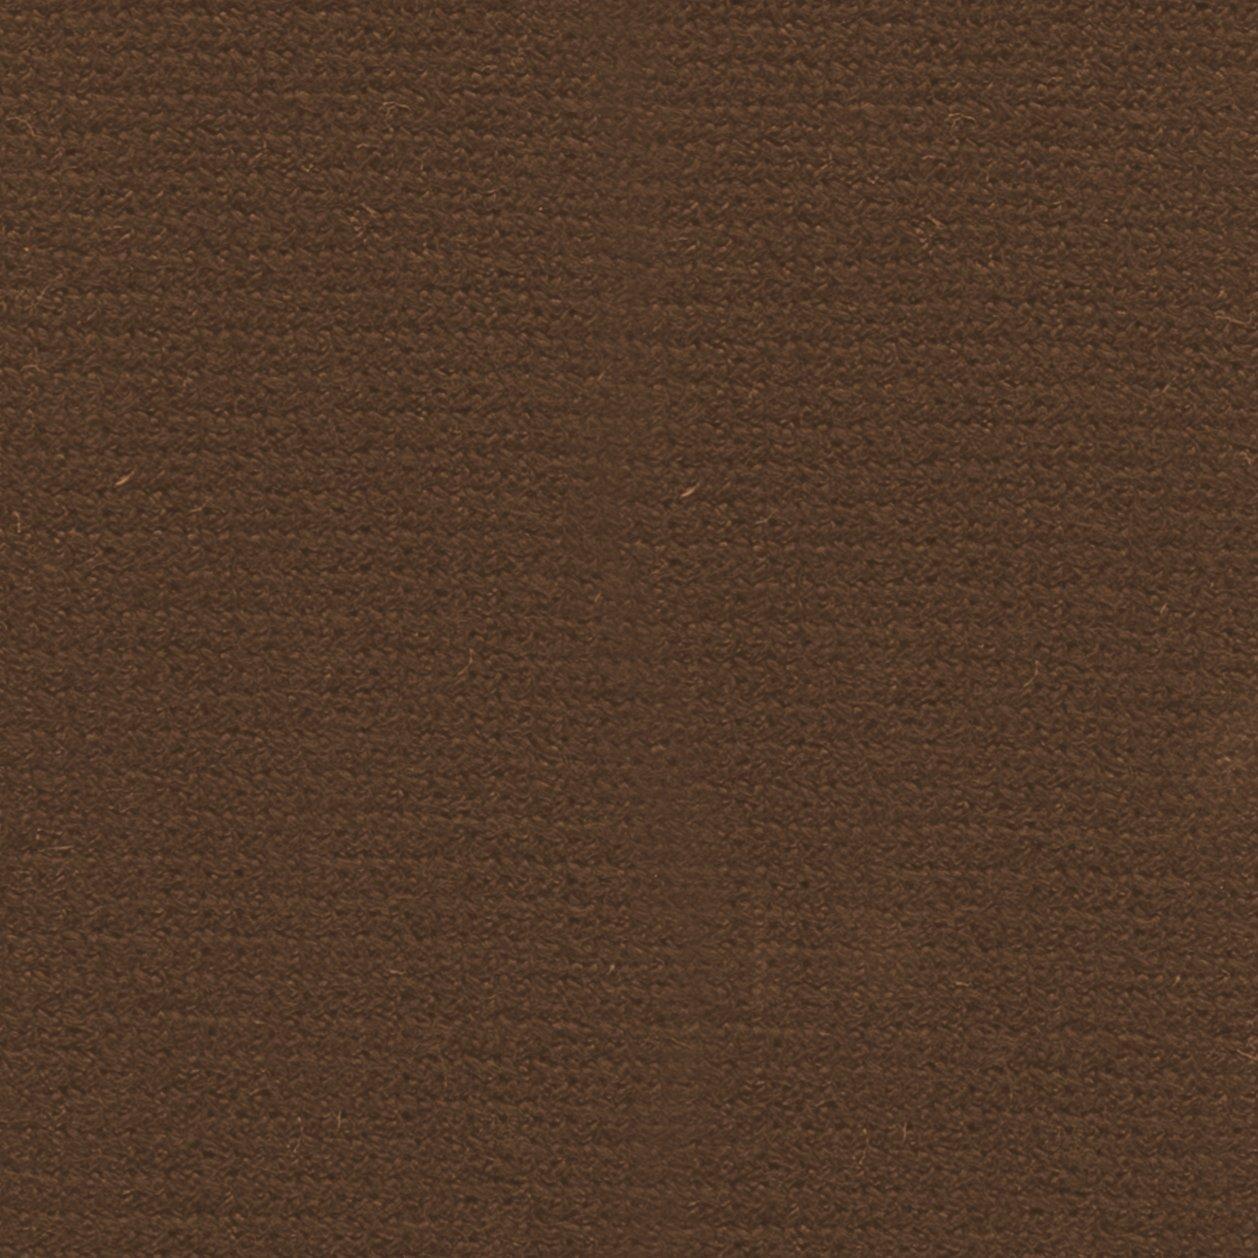 sale retailer 62f1c 5d83d Brown Jordan 11/16